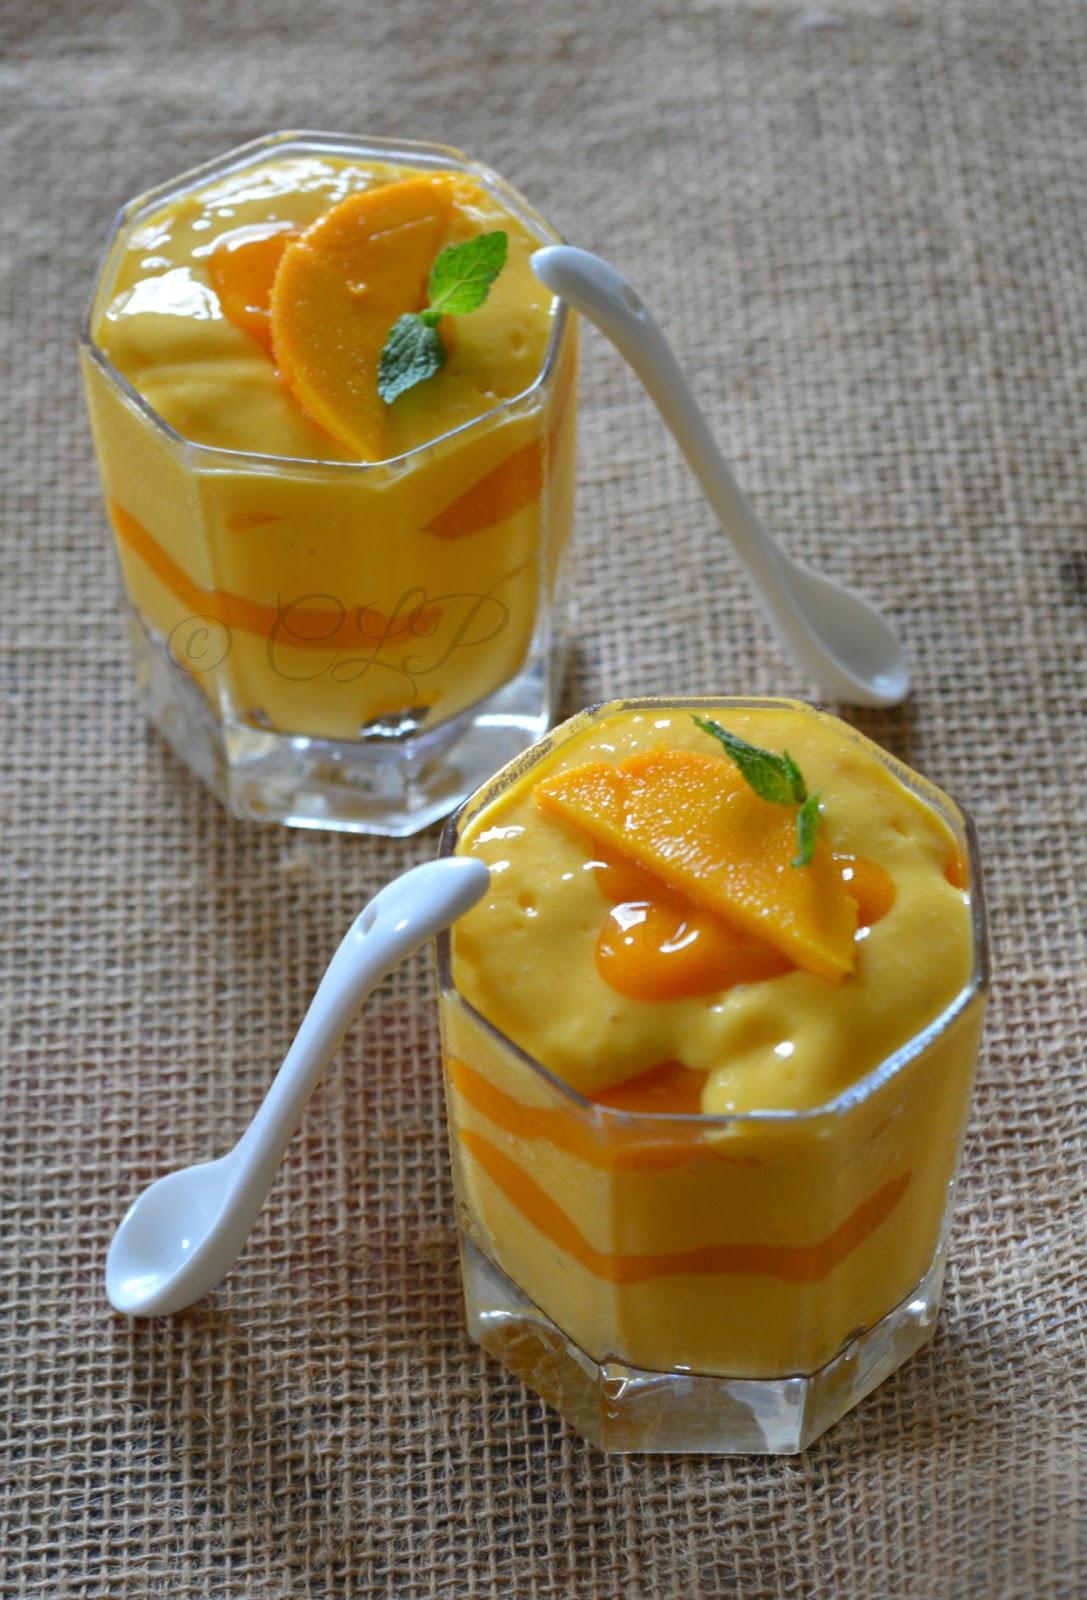 Mango Dessert Recipes  Cook like Priya Low Fat Mango Fool